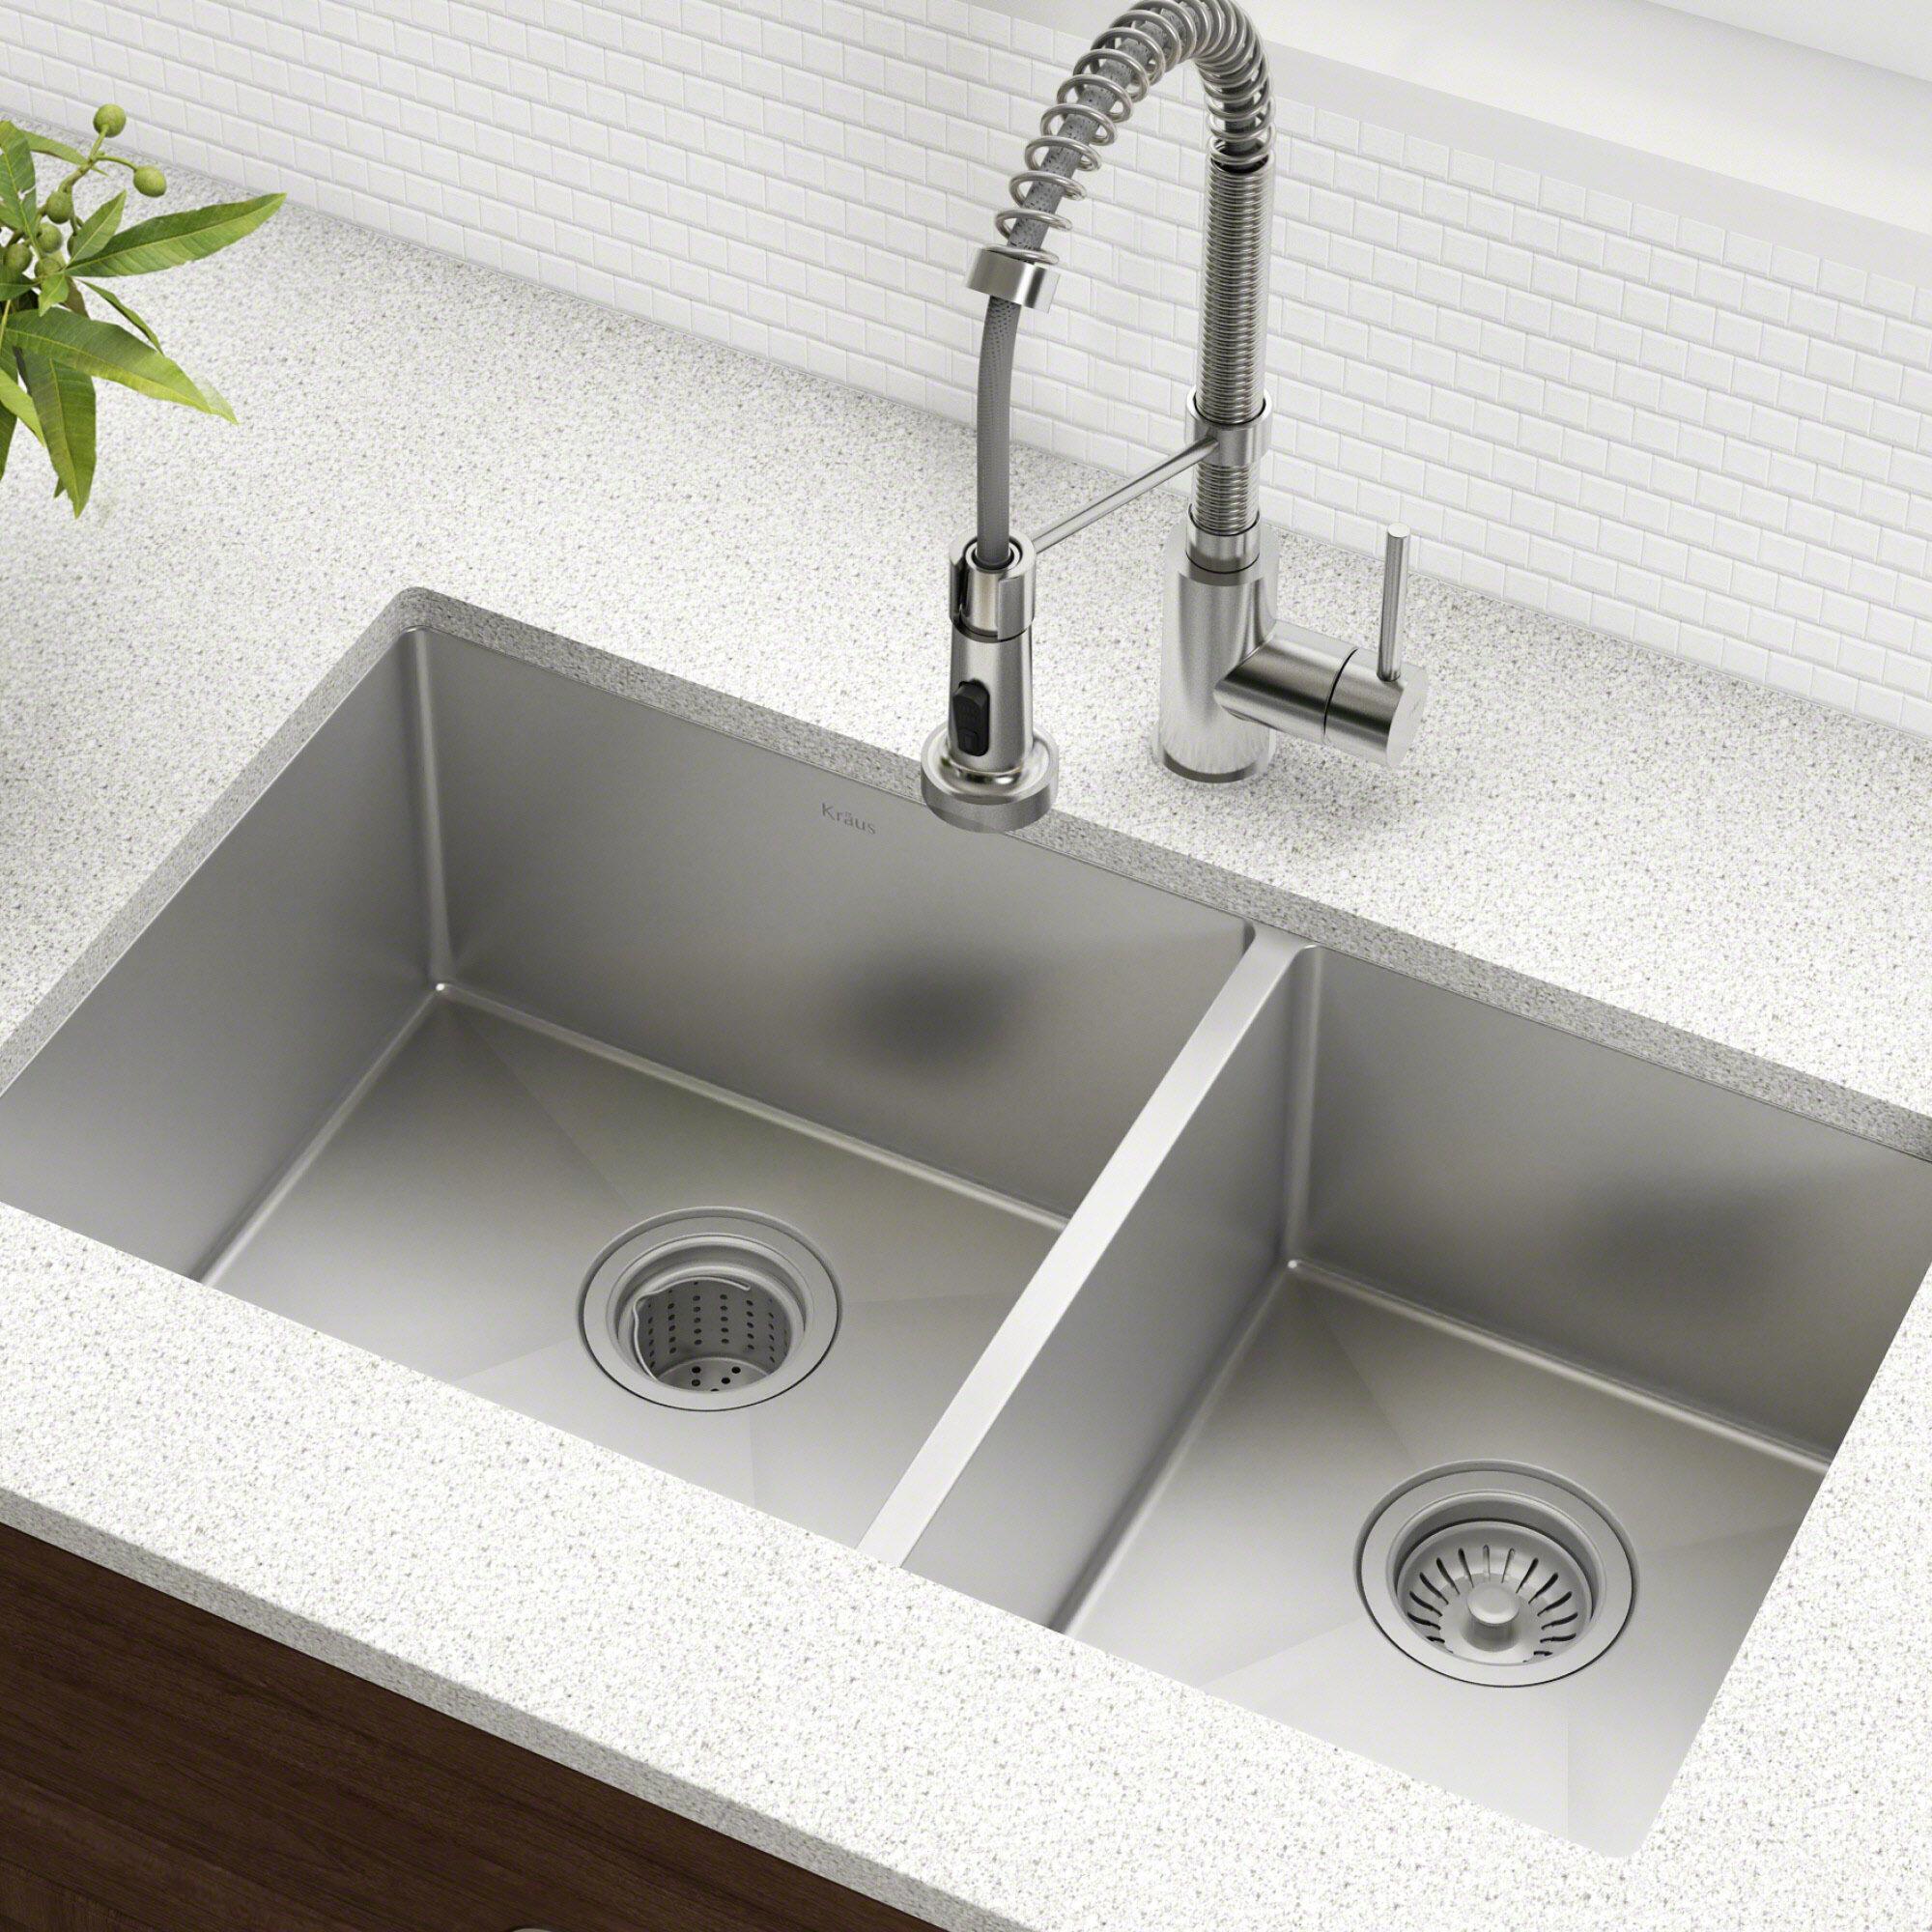 khu103 33 kraus kitchen sink 33 l x 19 w double basin undermount rh wayfair com kitchen sink double vs single bowl kitchen sinks double drainer